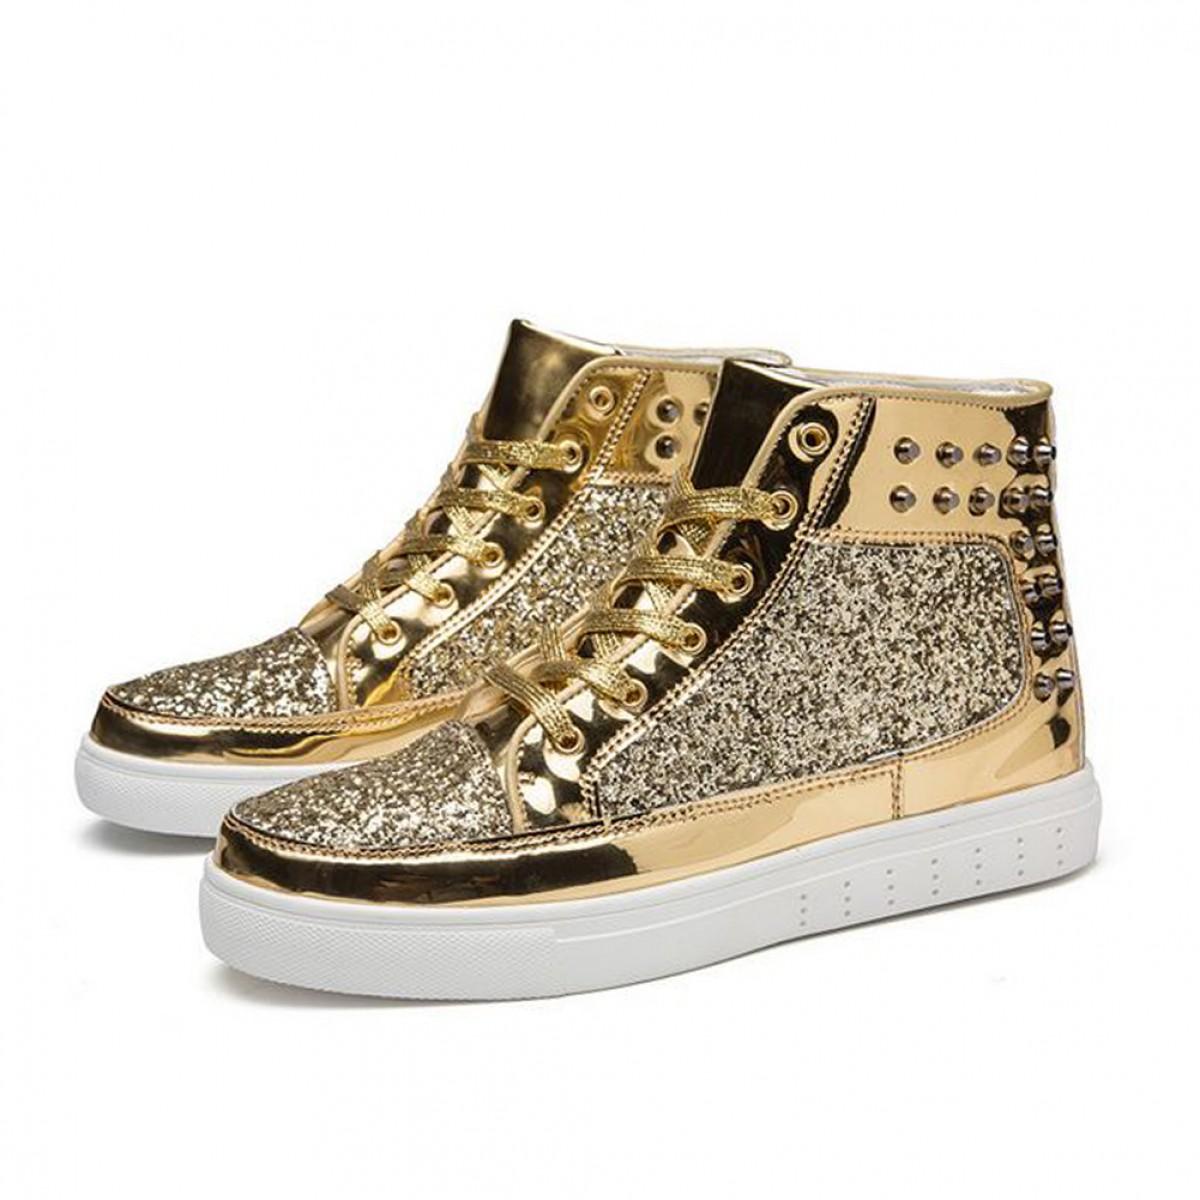 Gold Glitter High Tops Sizes 6.5-10.5  05ee4e26c